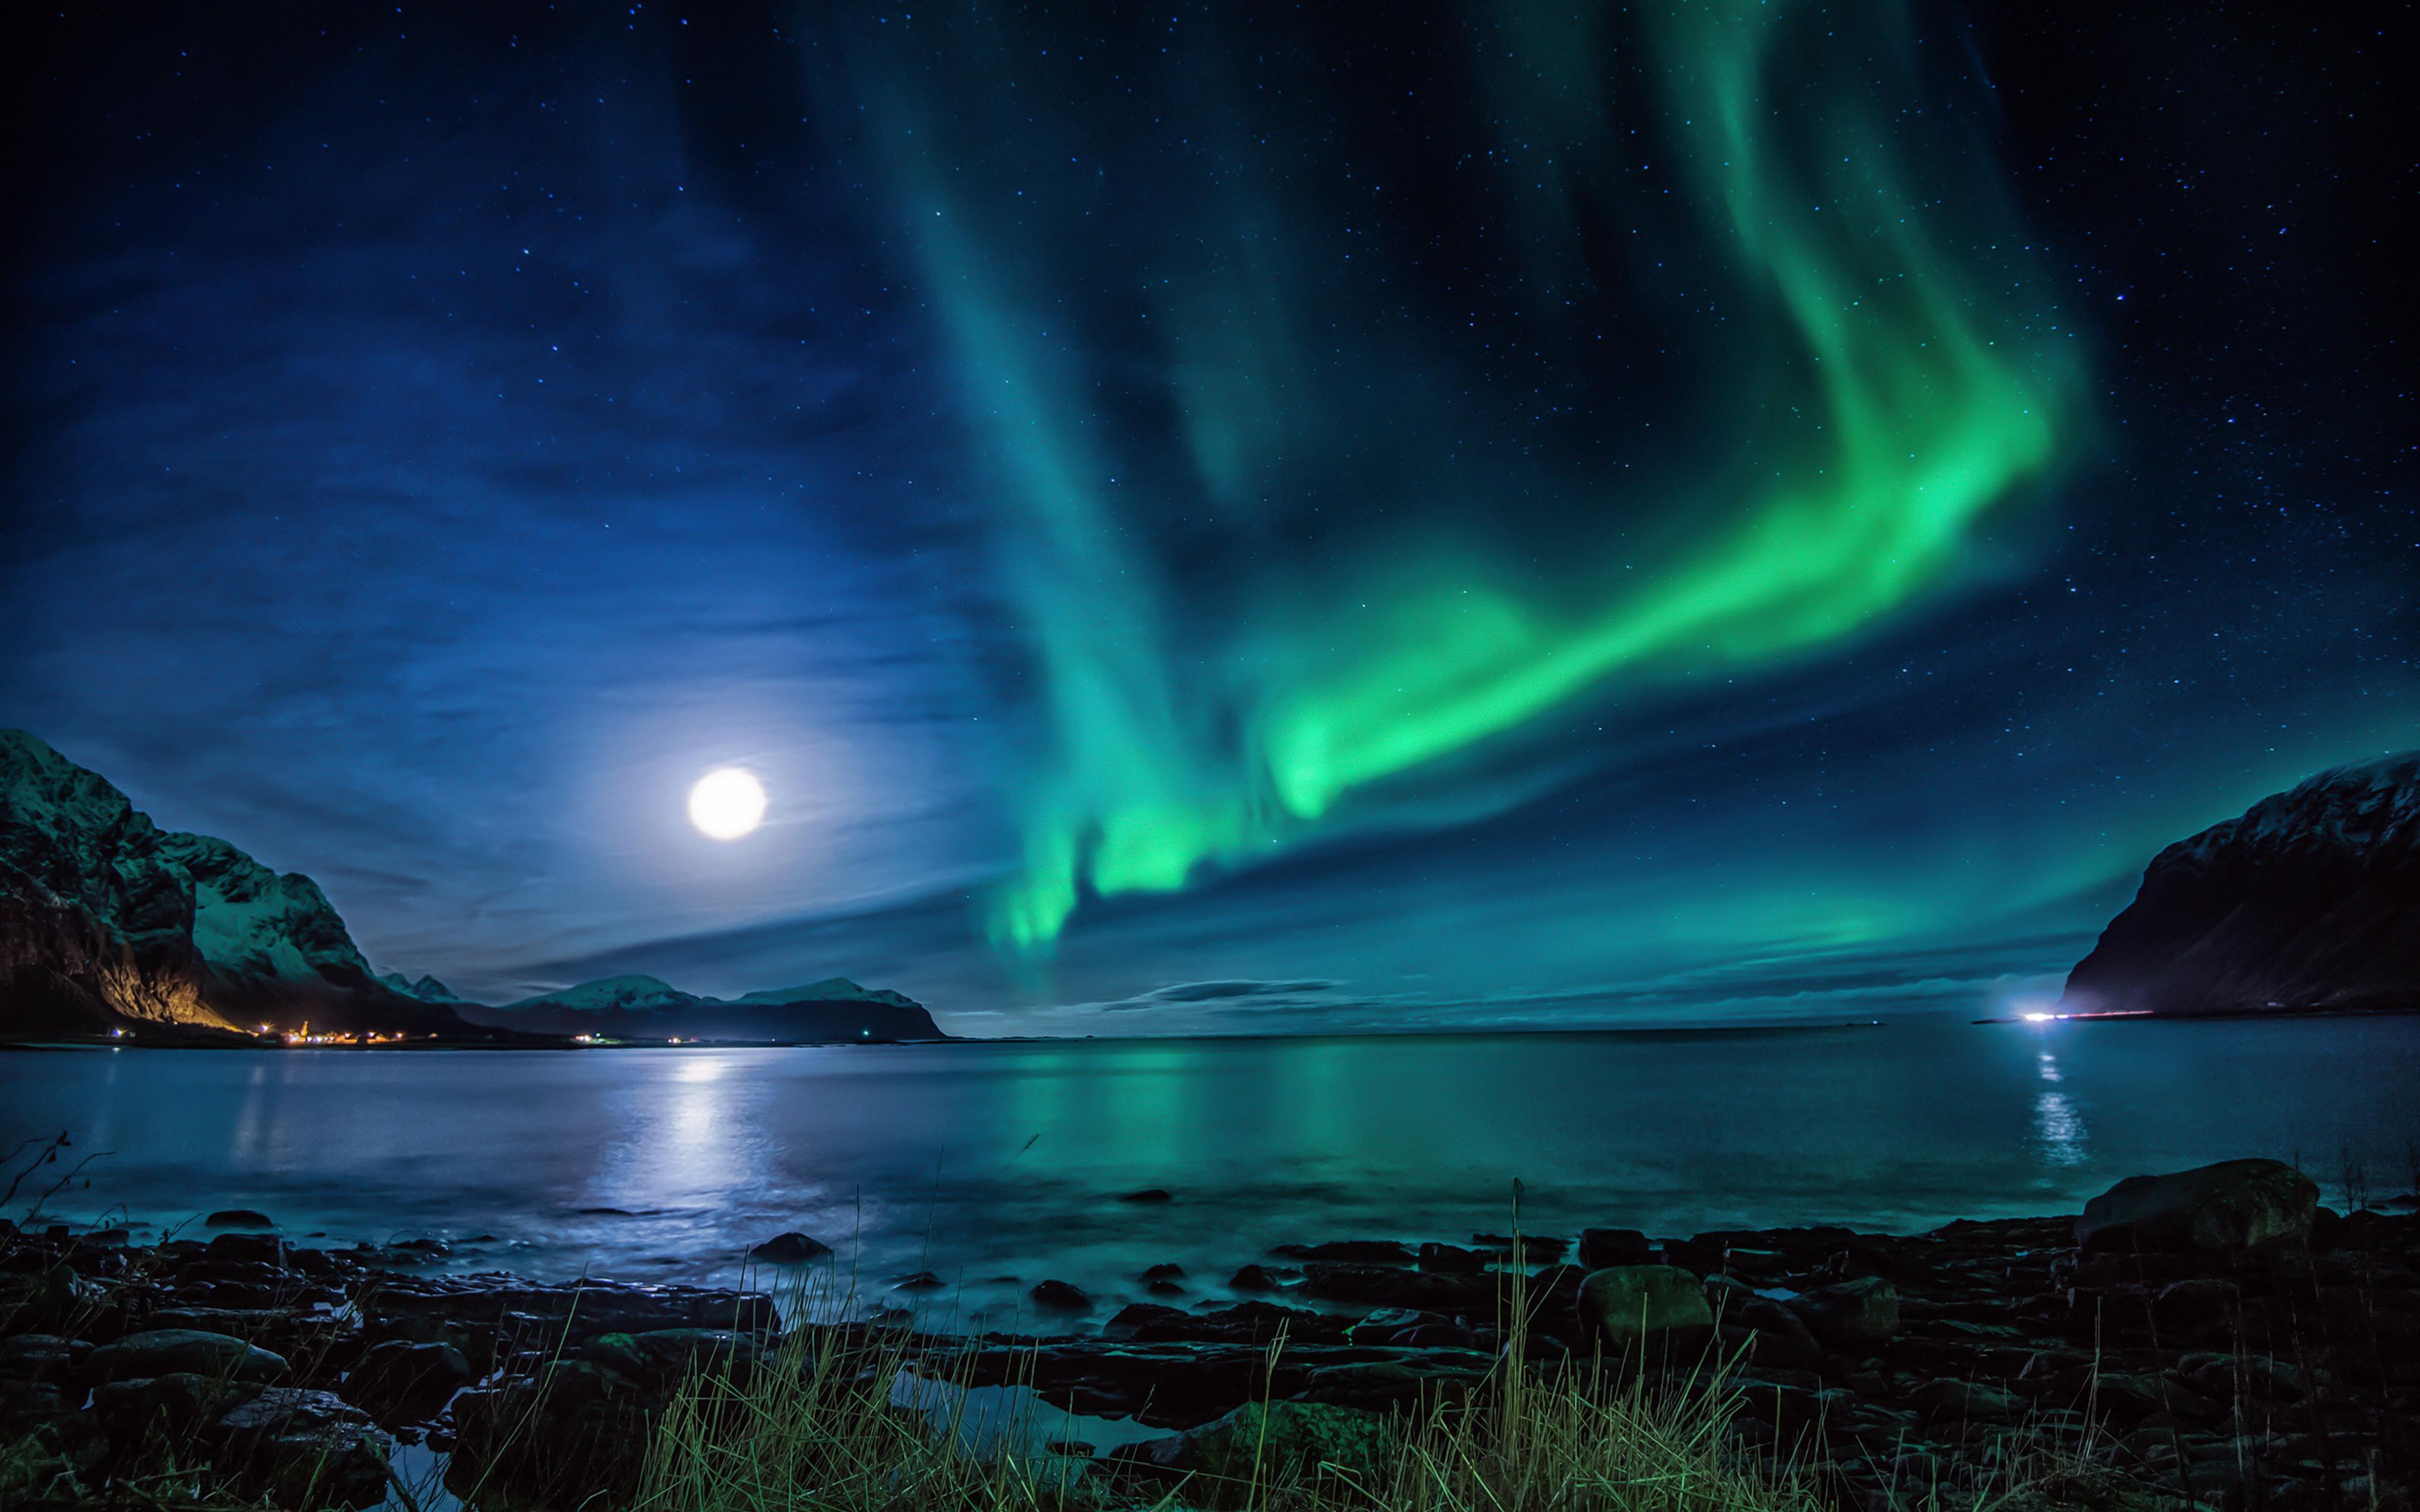 3840x2400 Aurora Borealis Moon Night 4k HD 4k Wallpapers ...